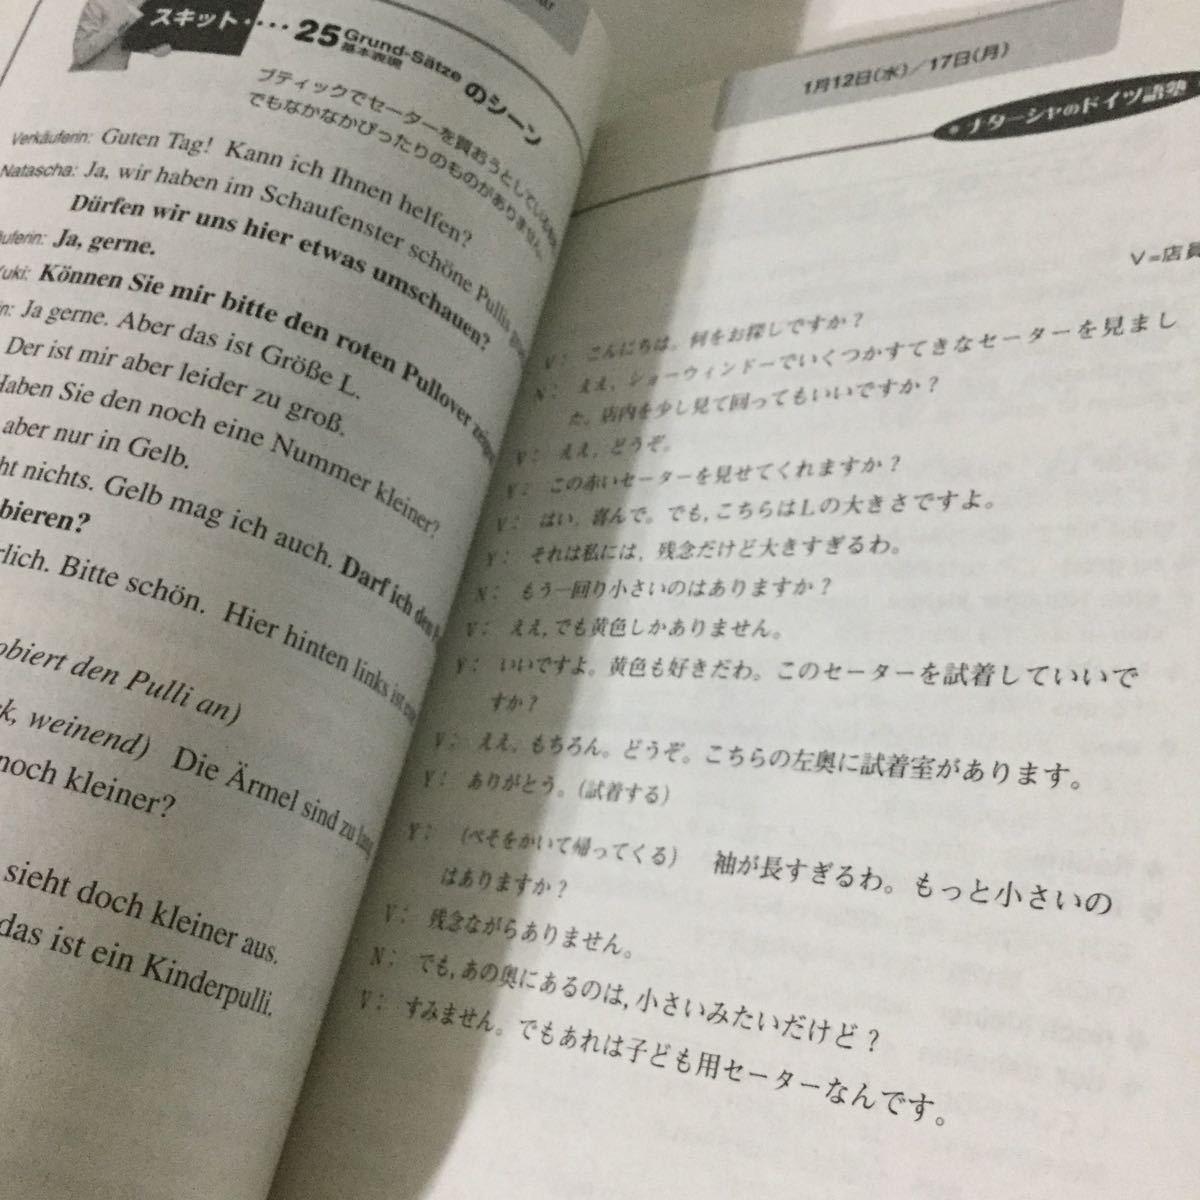 42 NHKテレビドイツ語会話1 2005年1月1日発行1月号 相澤啓一 日本放送出版協会 本 英語 ドイツ語 発音 ナターシャのドイツ語 英会話 辞書_画像8